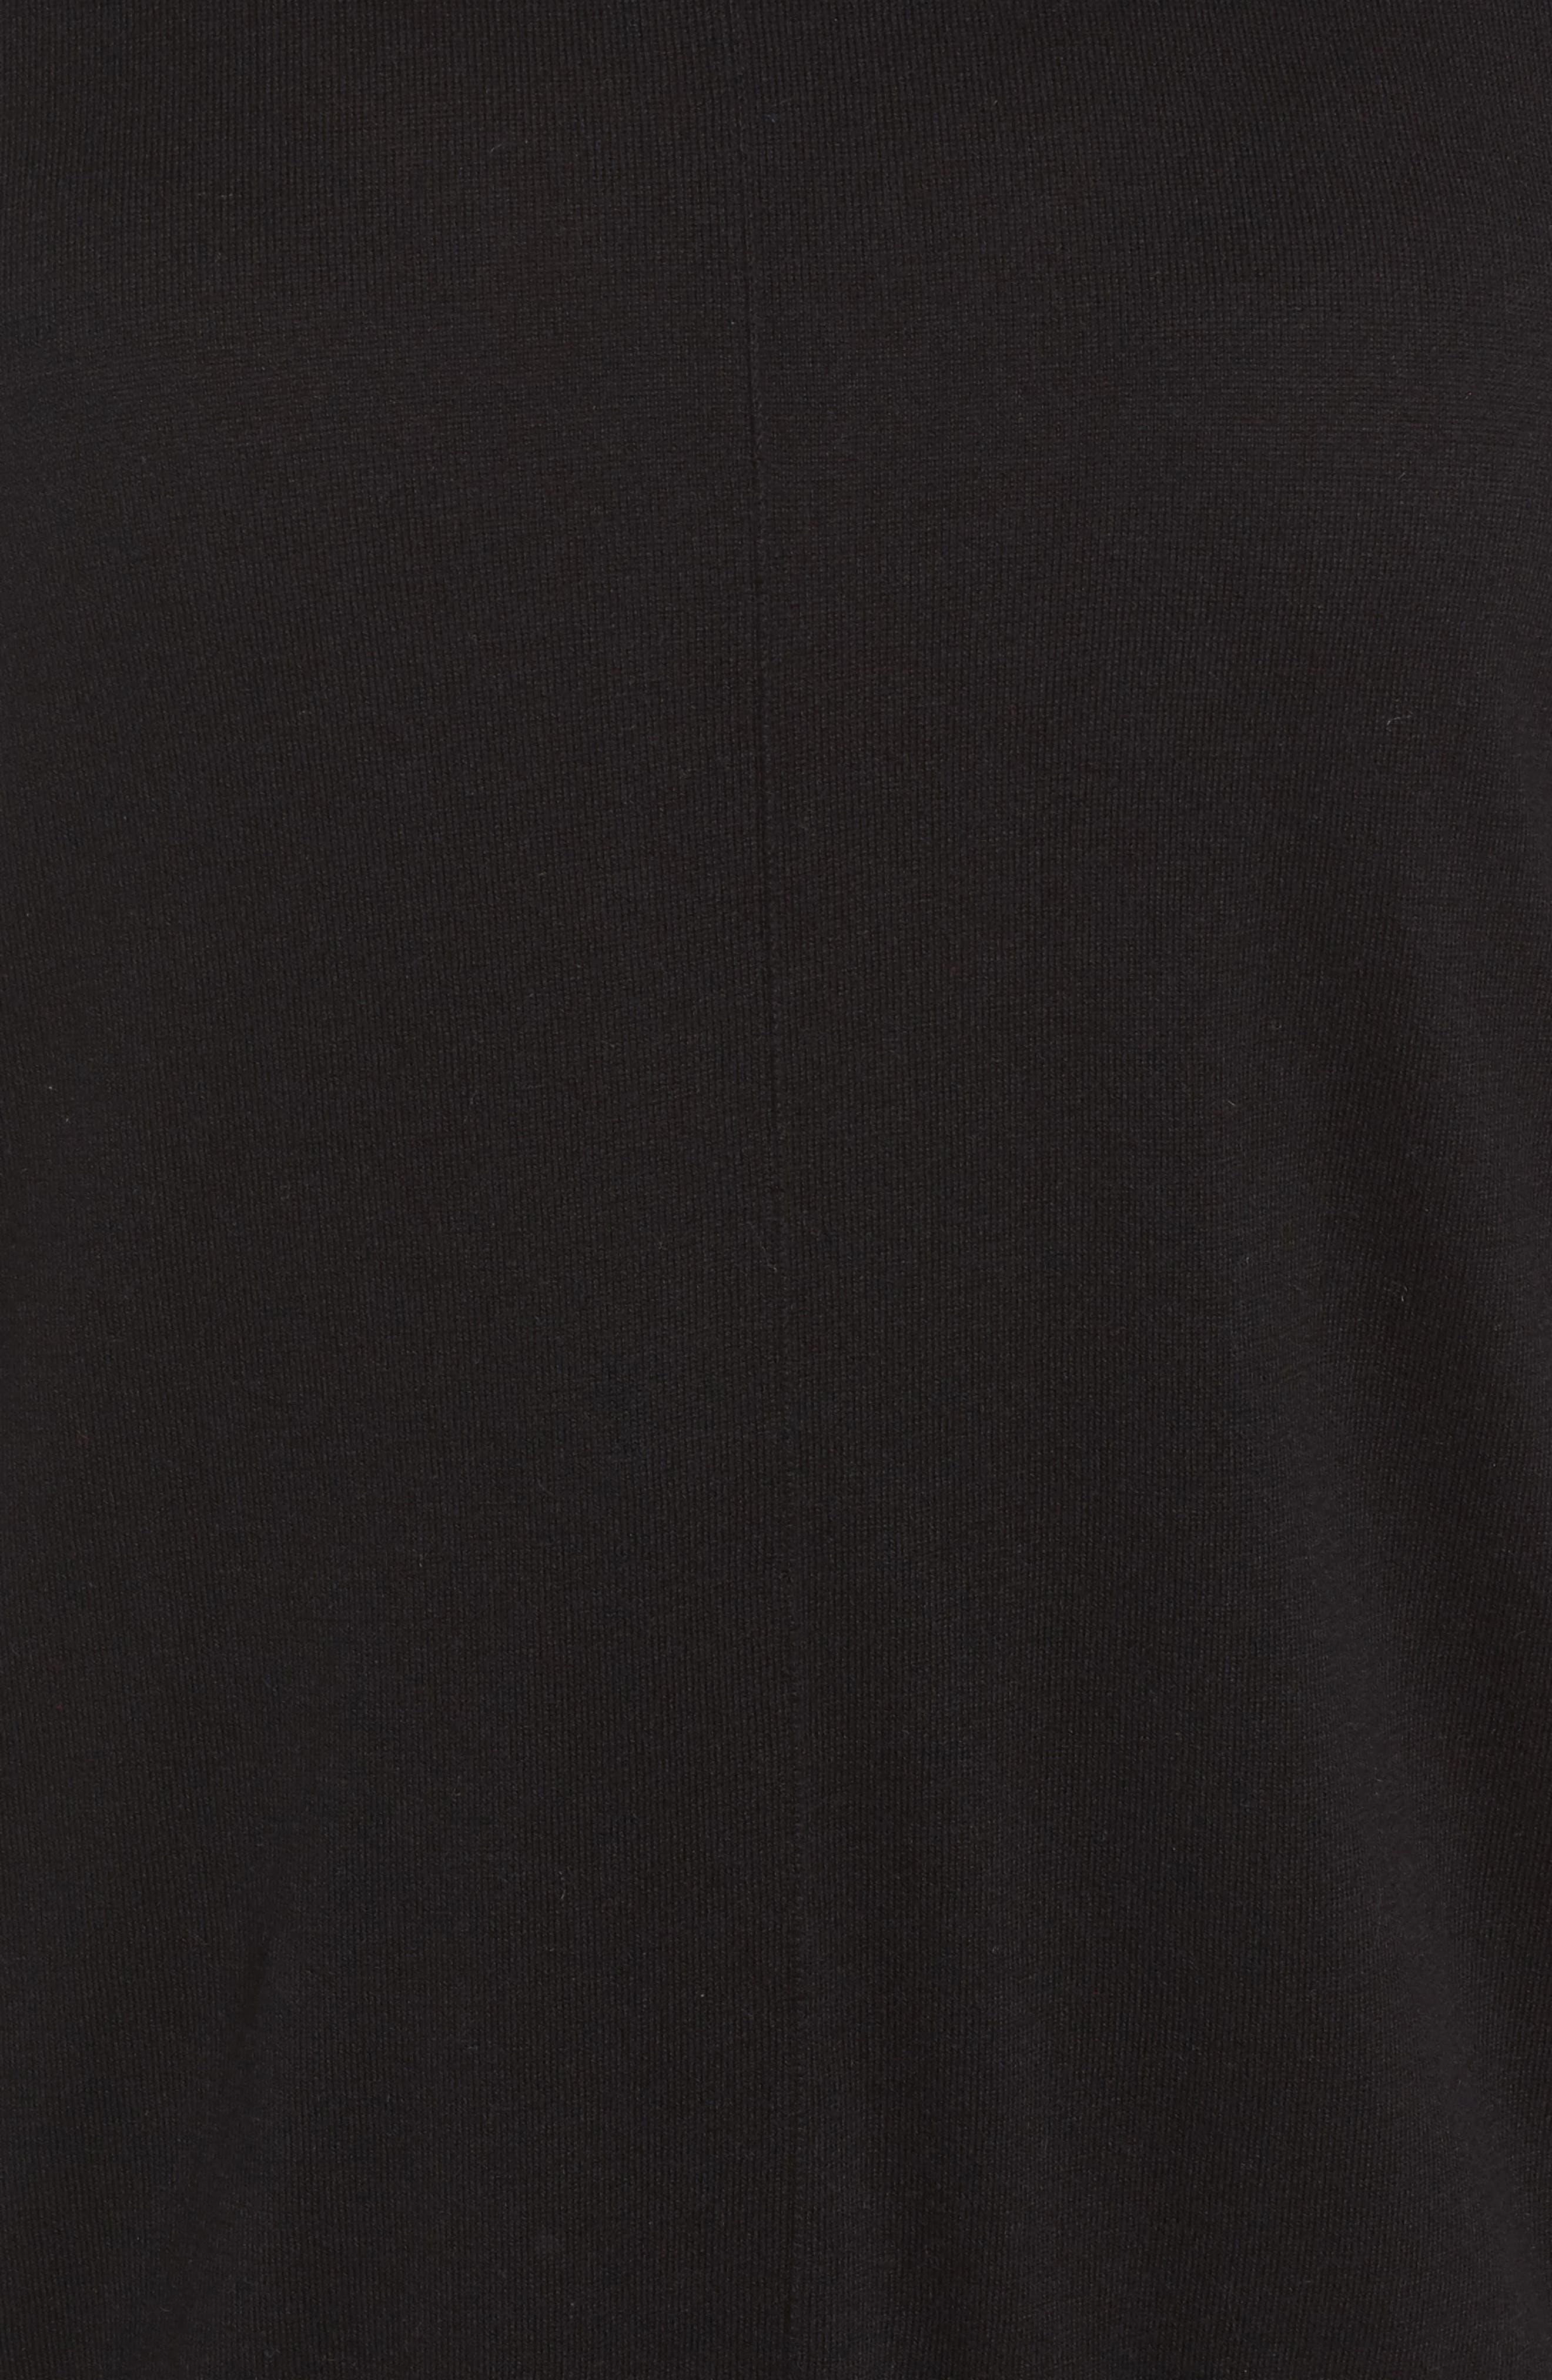 Dolman Sleeve Sweater,                             Alternate thumbnail 5, color,                             001